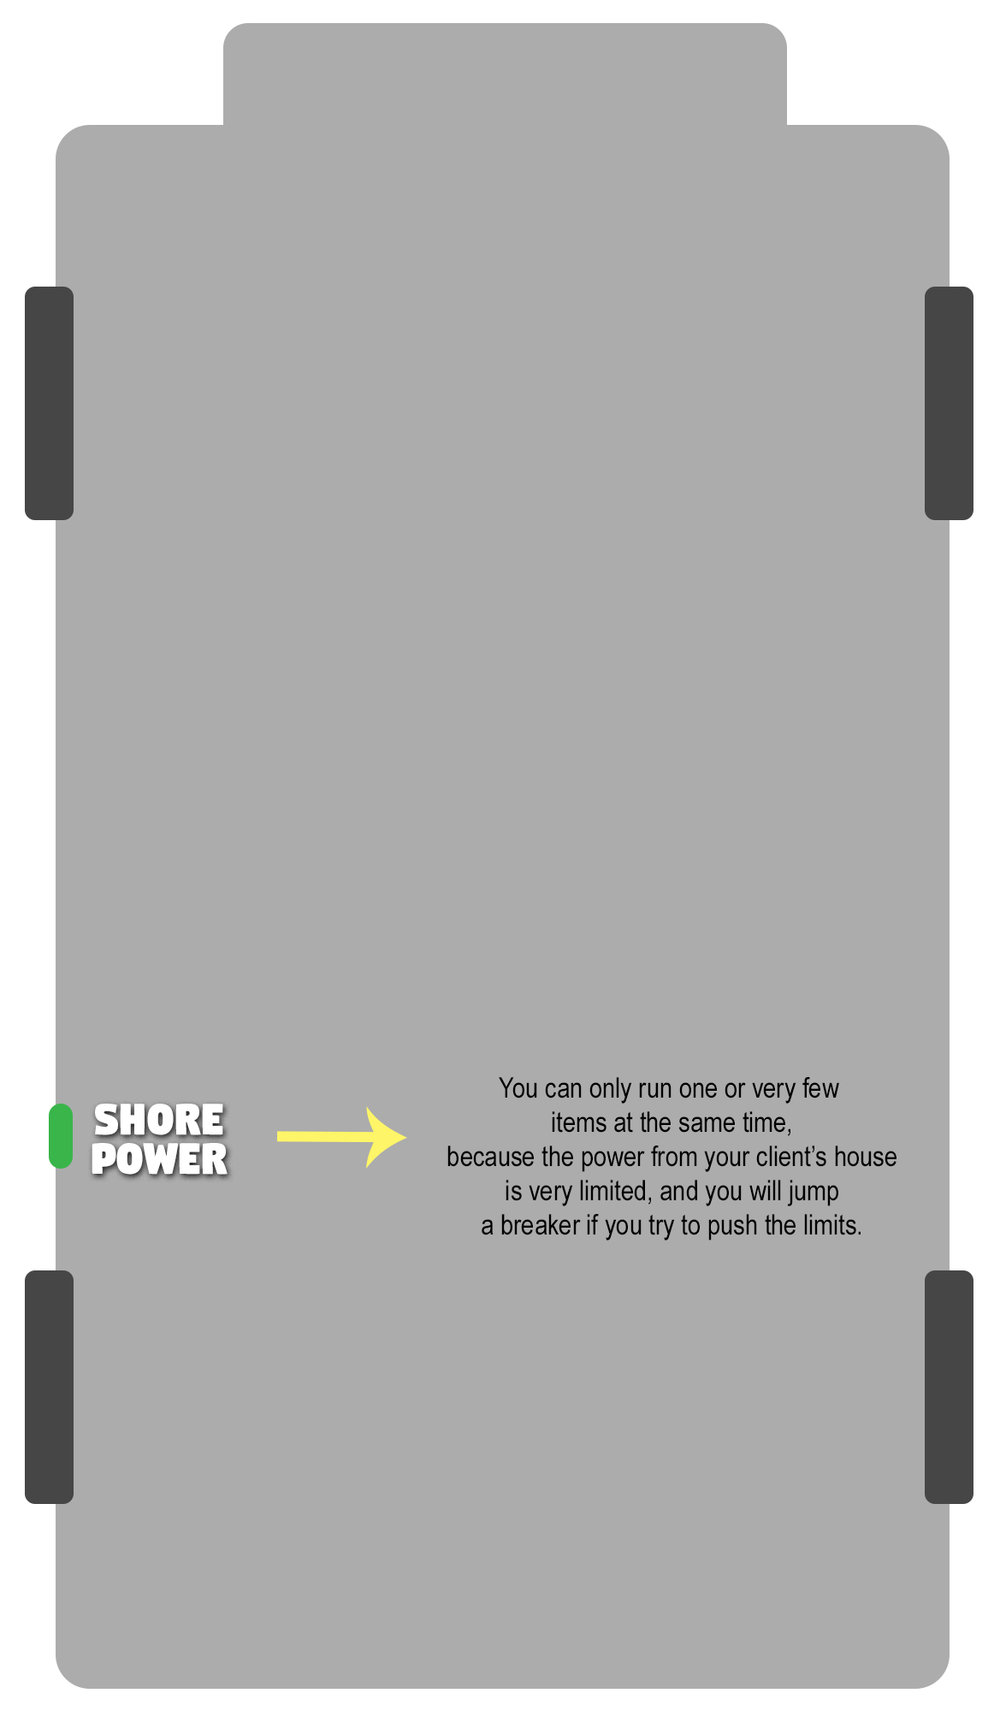 van diagram with shore power.jpg